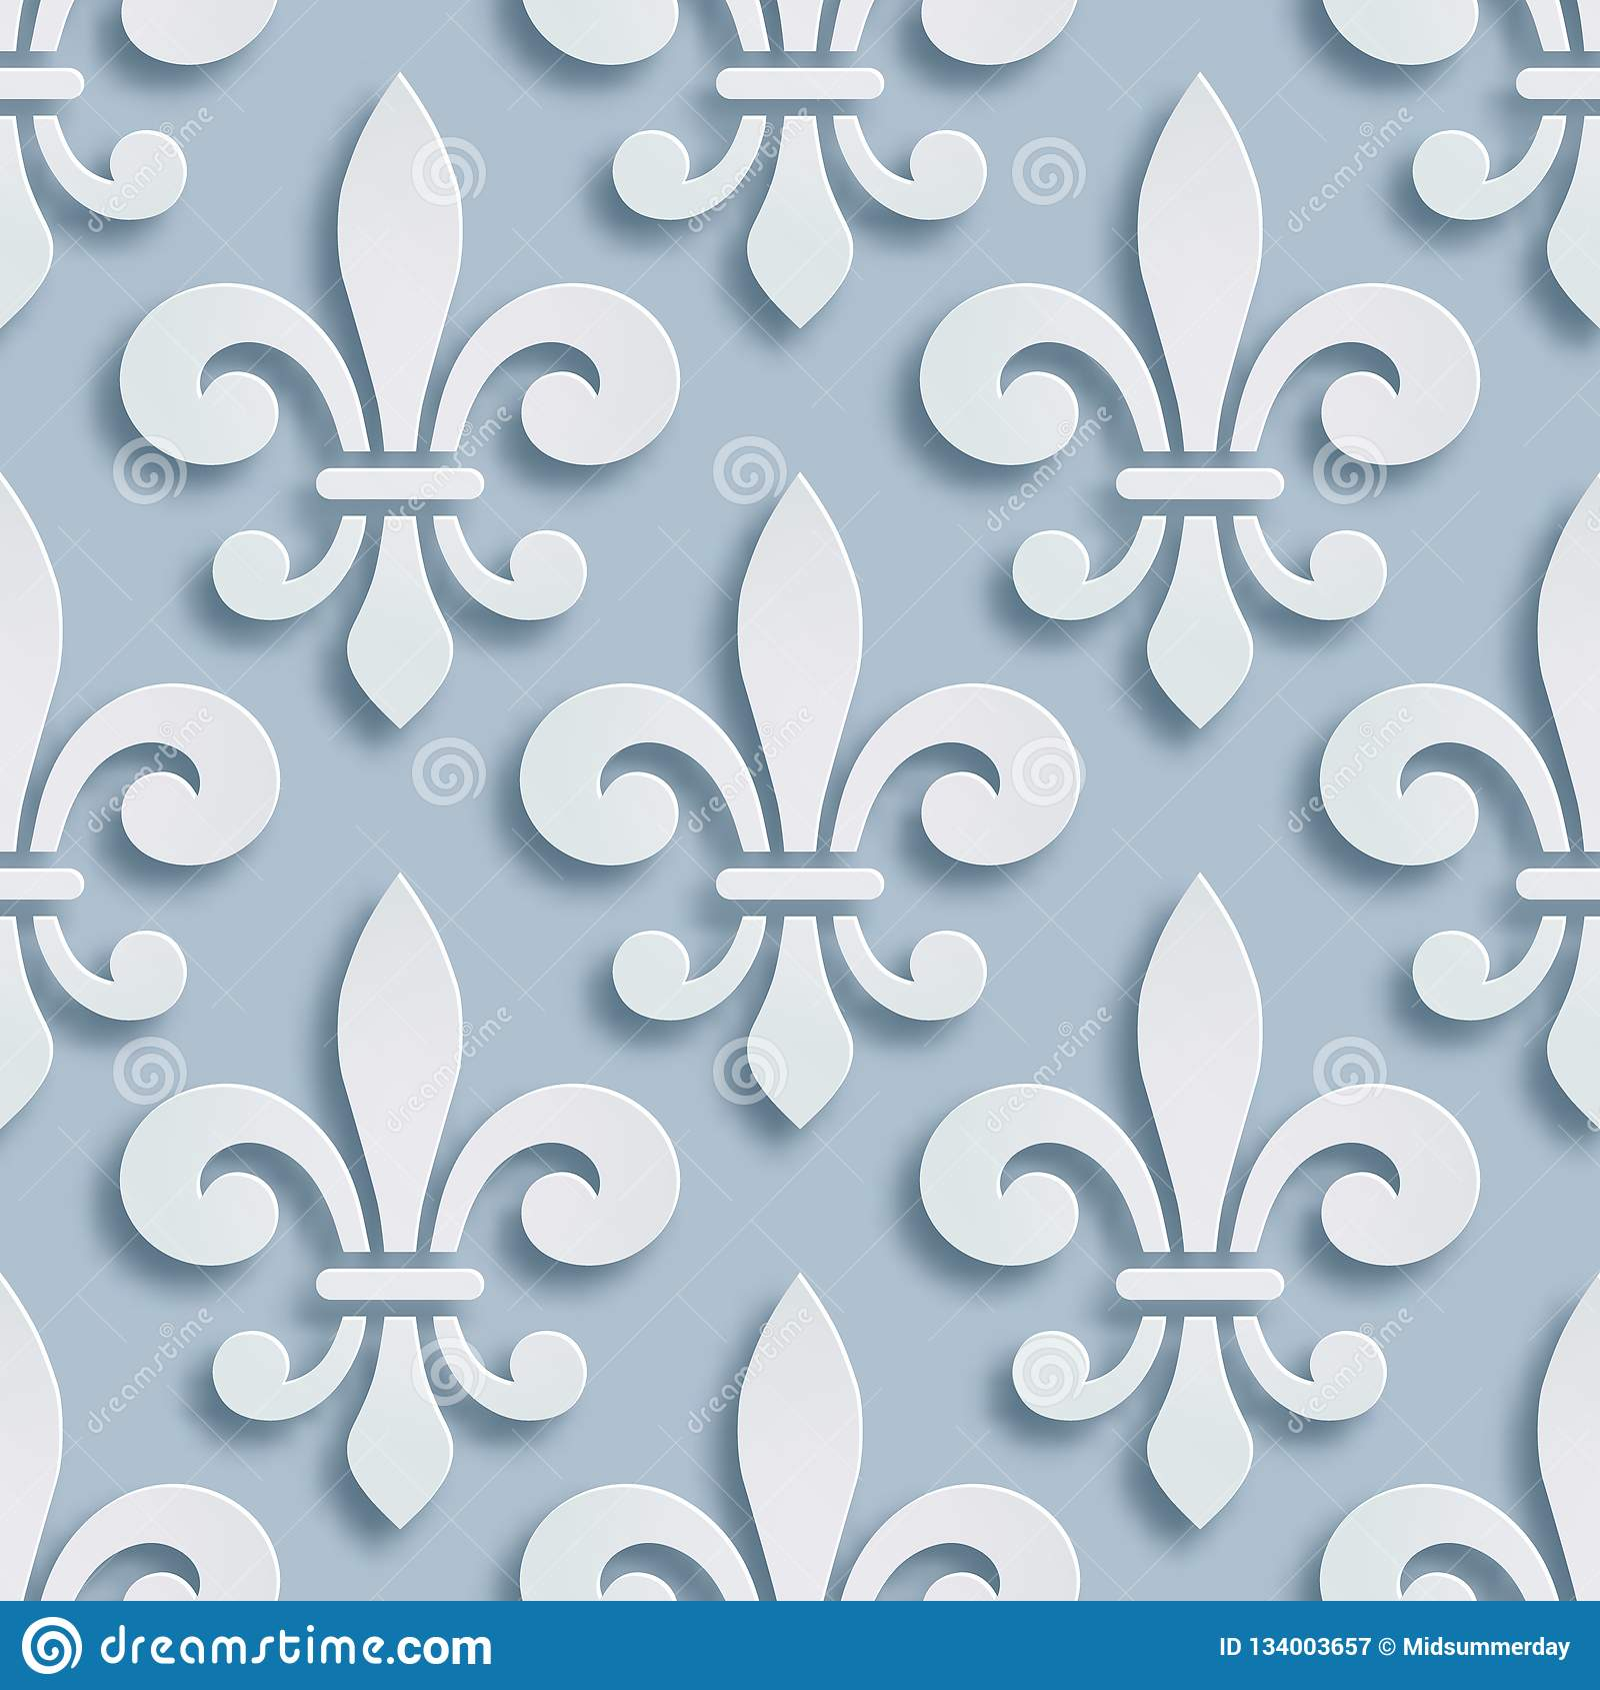 Fleur De Lis Seamless Background Symbol Of French Heraldry Paper